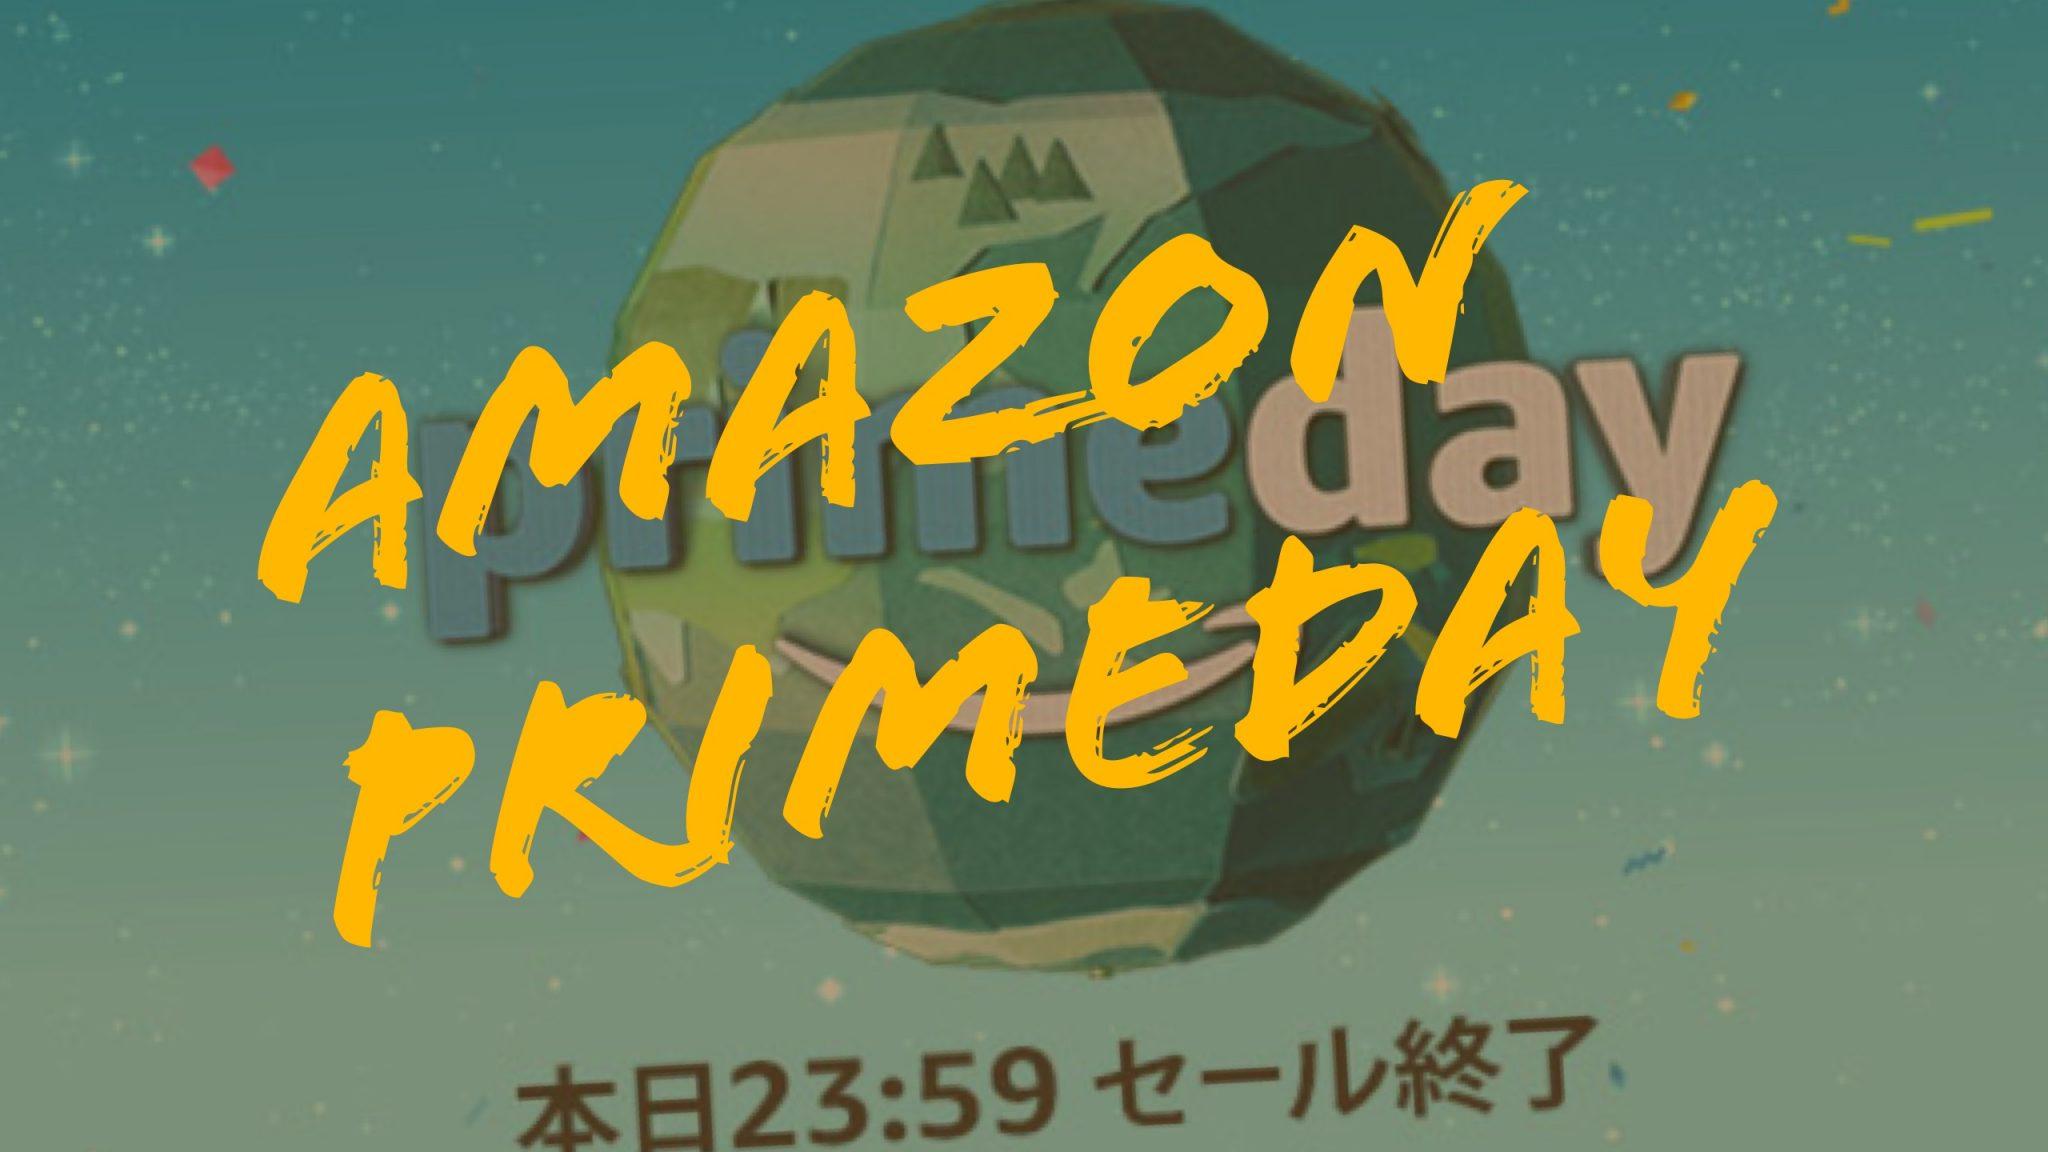 Amazonデバイス買うならプライムデーに買わないでいつ買うの?今でしょー!